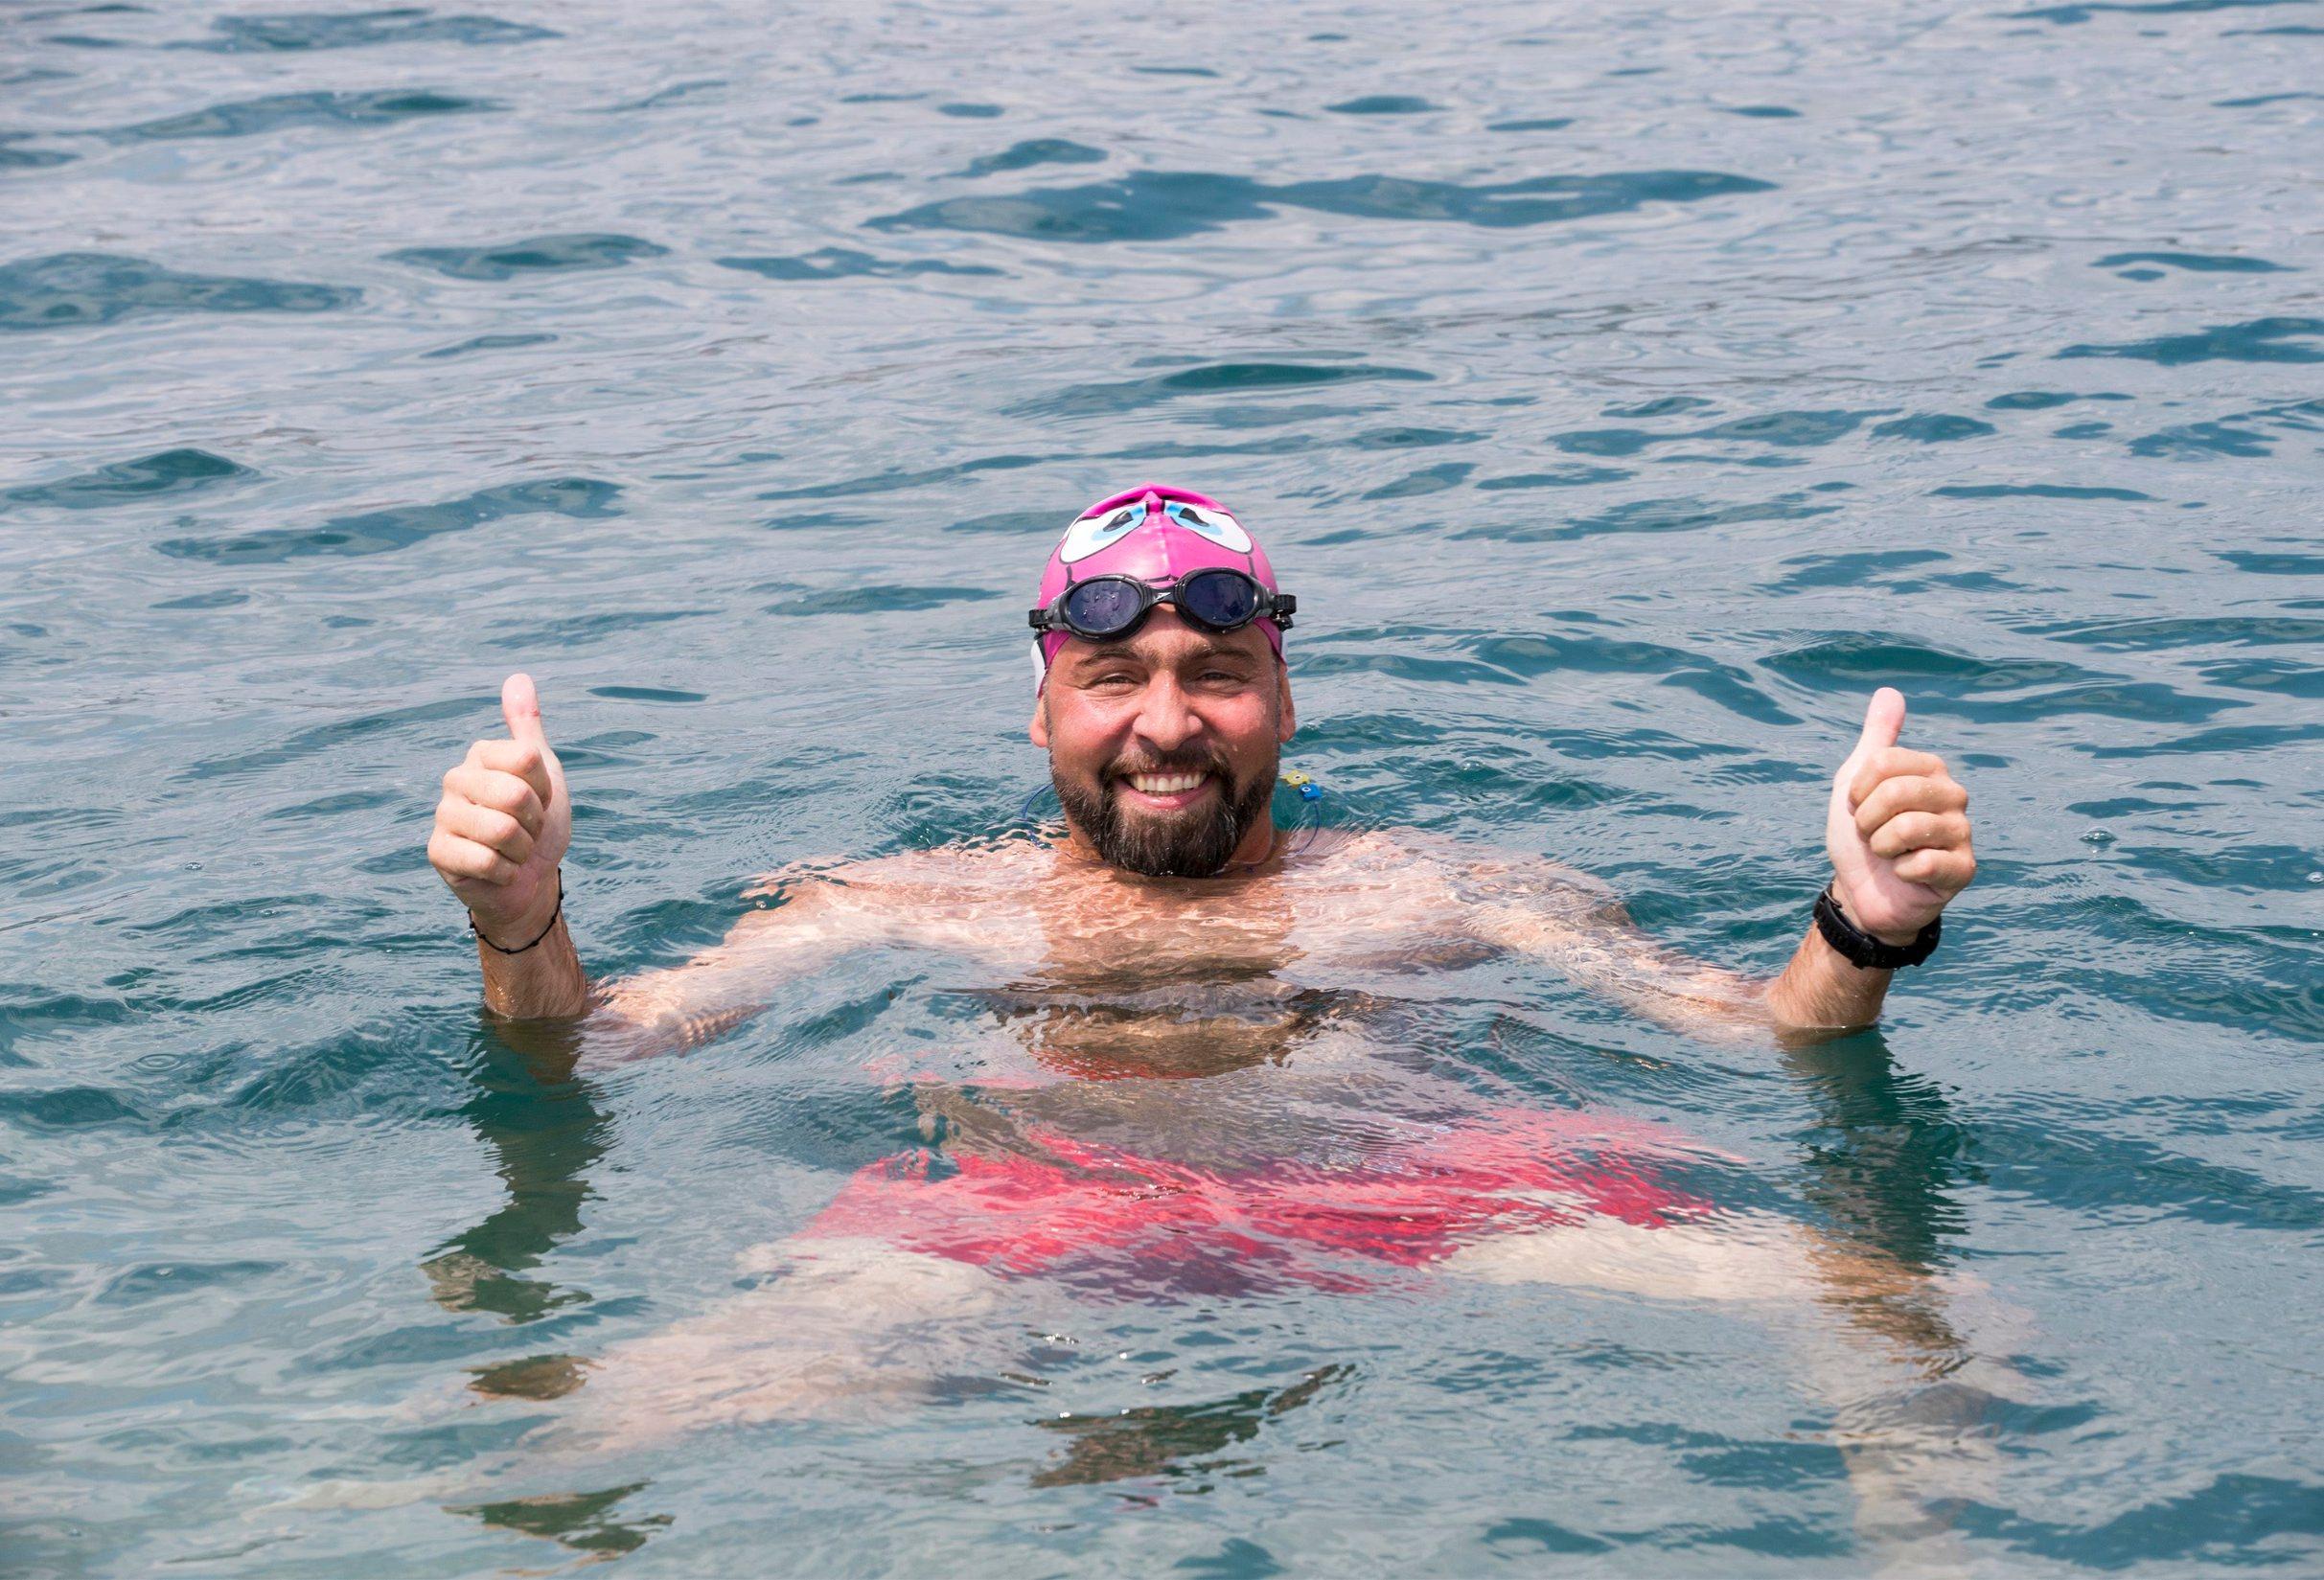 Okrug Gornji,290719 Novinar, bloger, profesor Domagoj Jakopovic Ribafish u Okrugu Gornjem. Ribafish plivao je u sklopi projekta RokOtok u spomen na svog sina Roka. Foto: Vladimir Dugandzic / CROPIX